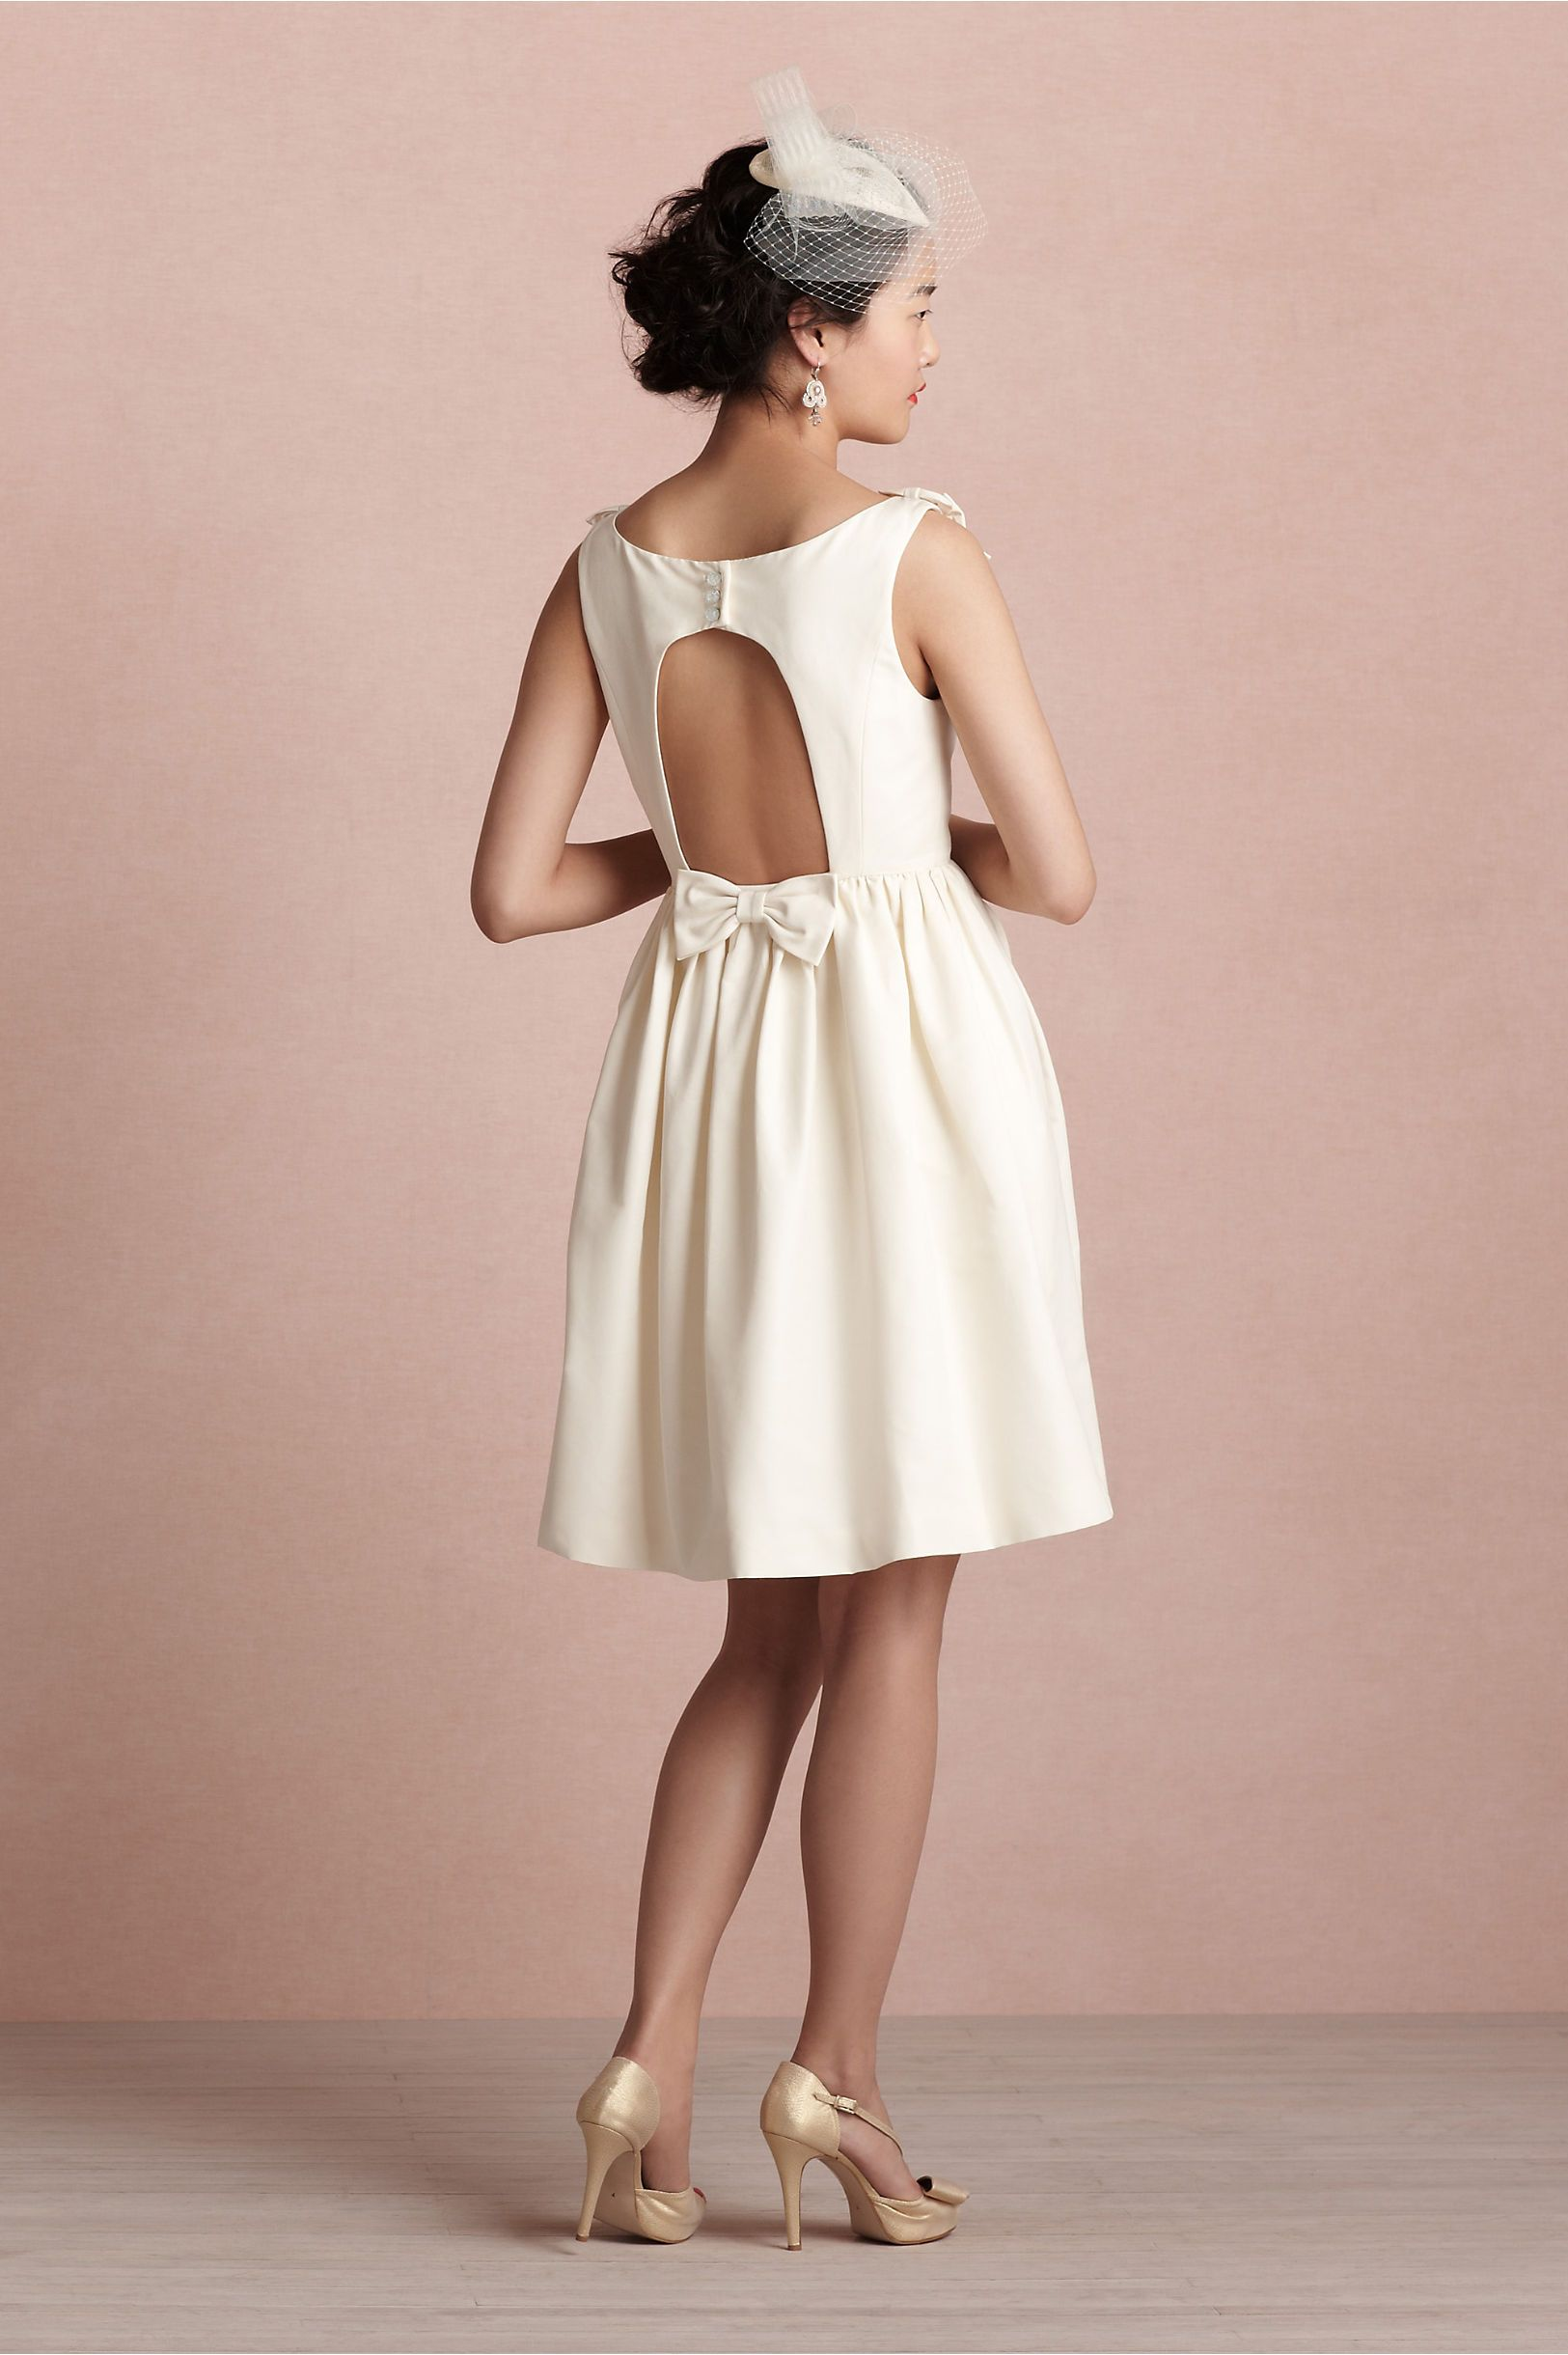 Dresses for wedding reception for bride  Pin by Rachel Halliday on Wedding procrastination  Pinterest